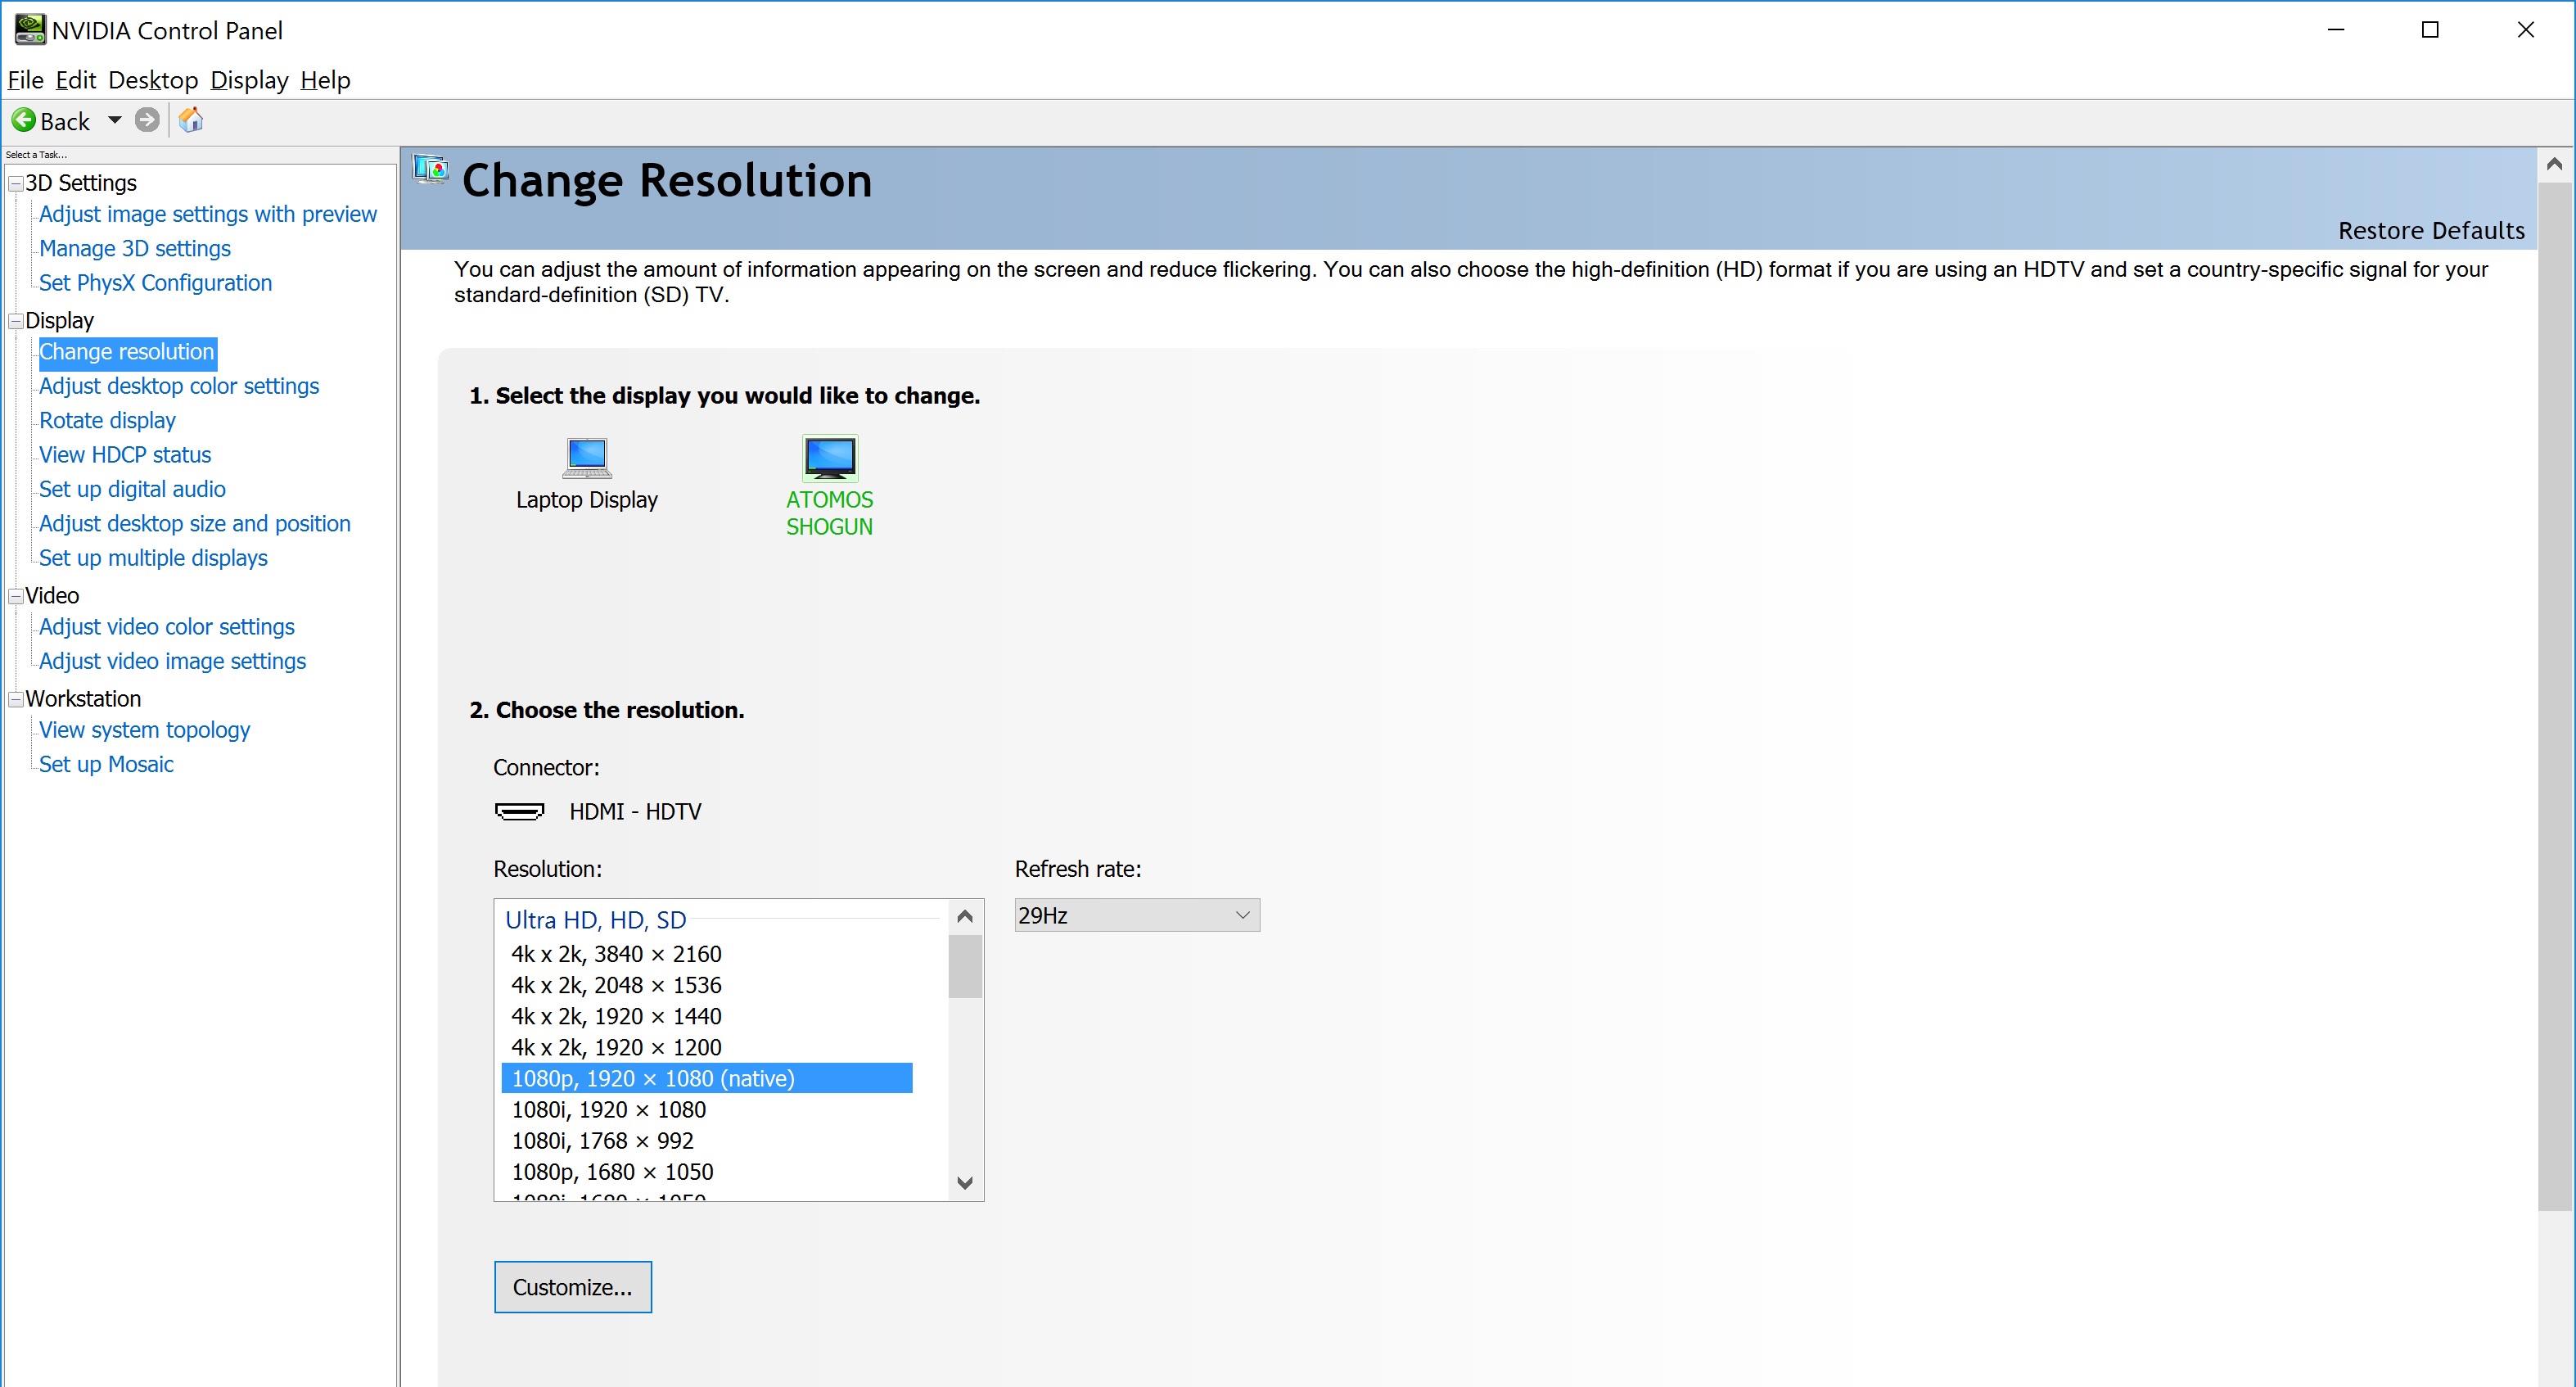 NVIDIA_screenshot_1080p29.97